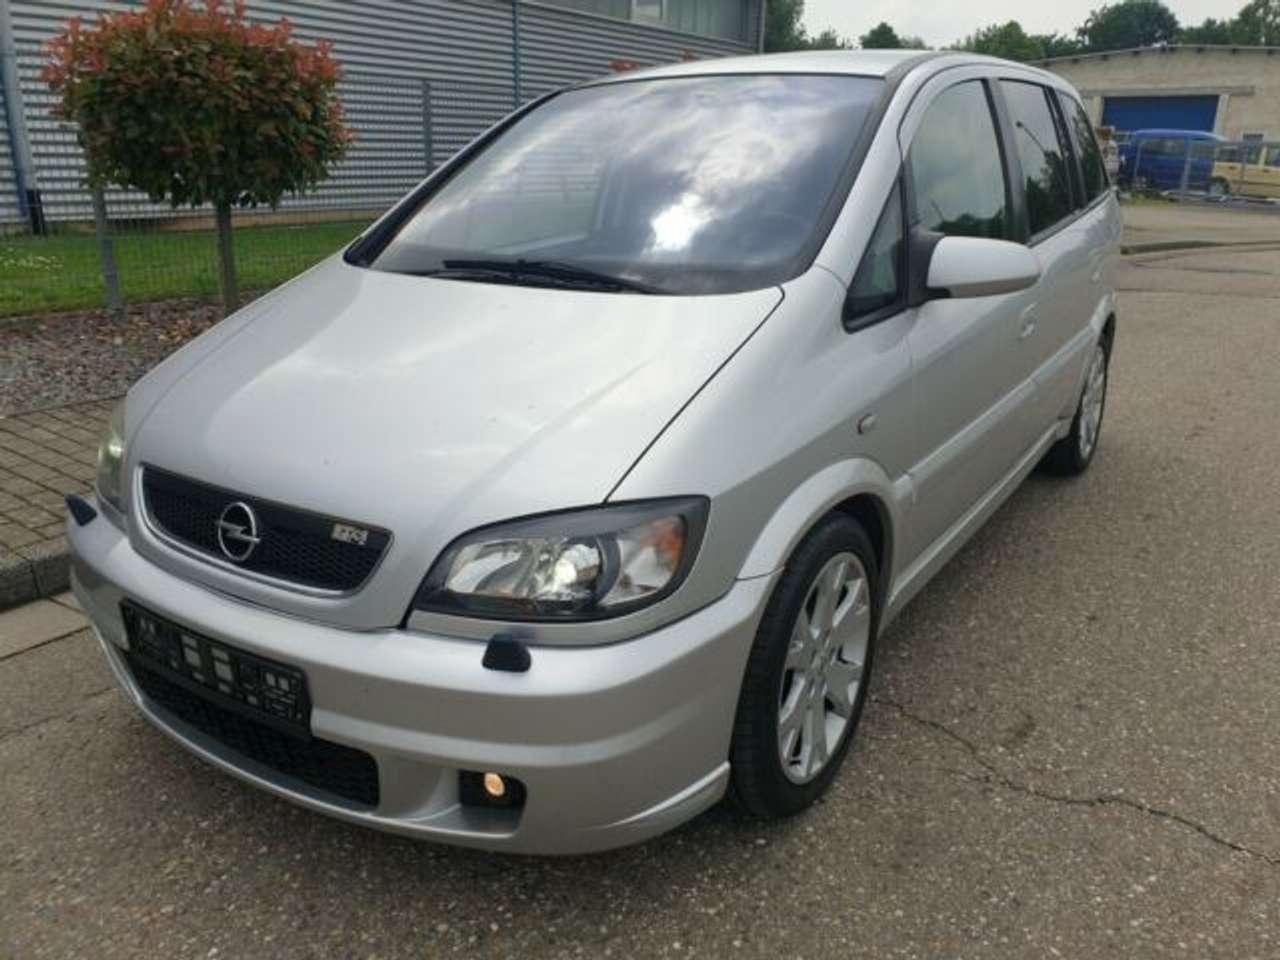 Autos nach Opel Zafira 2.0 Turbo